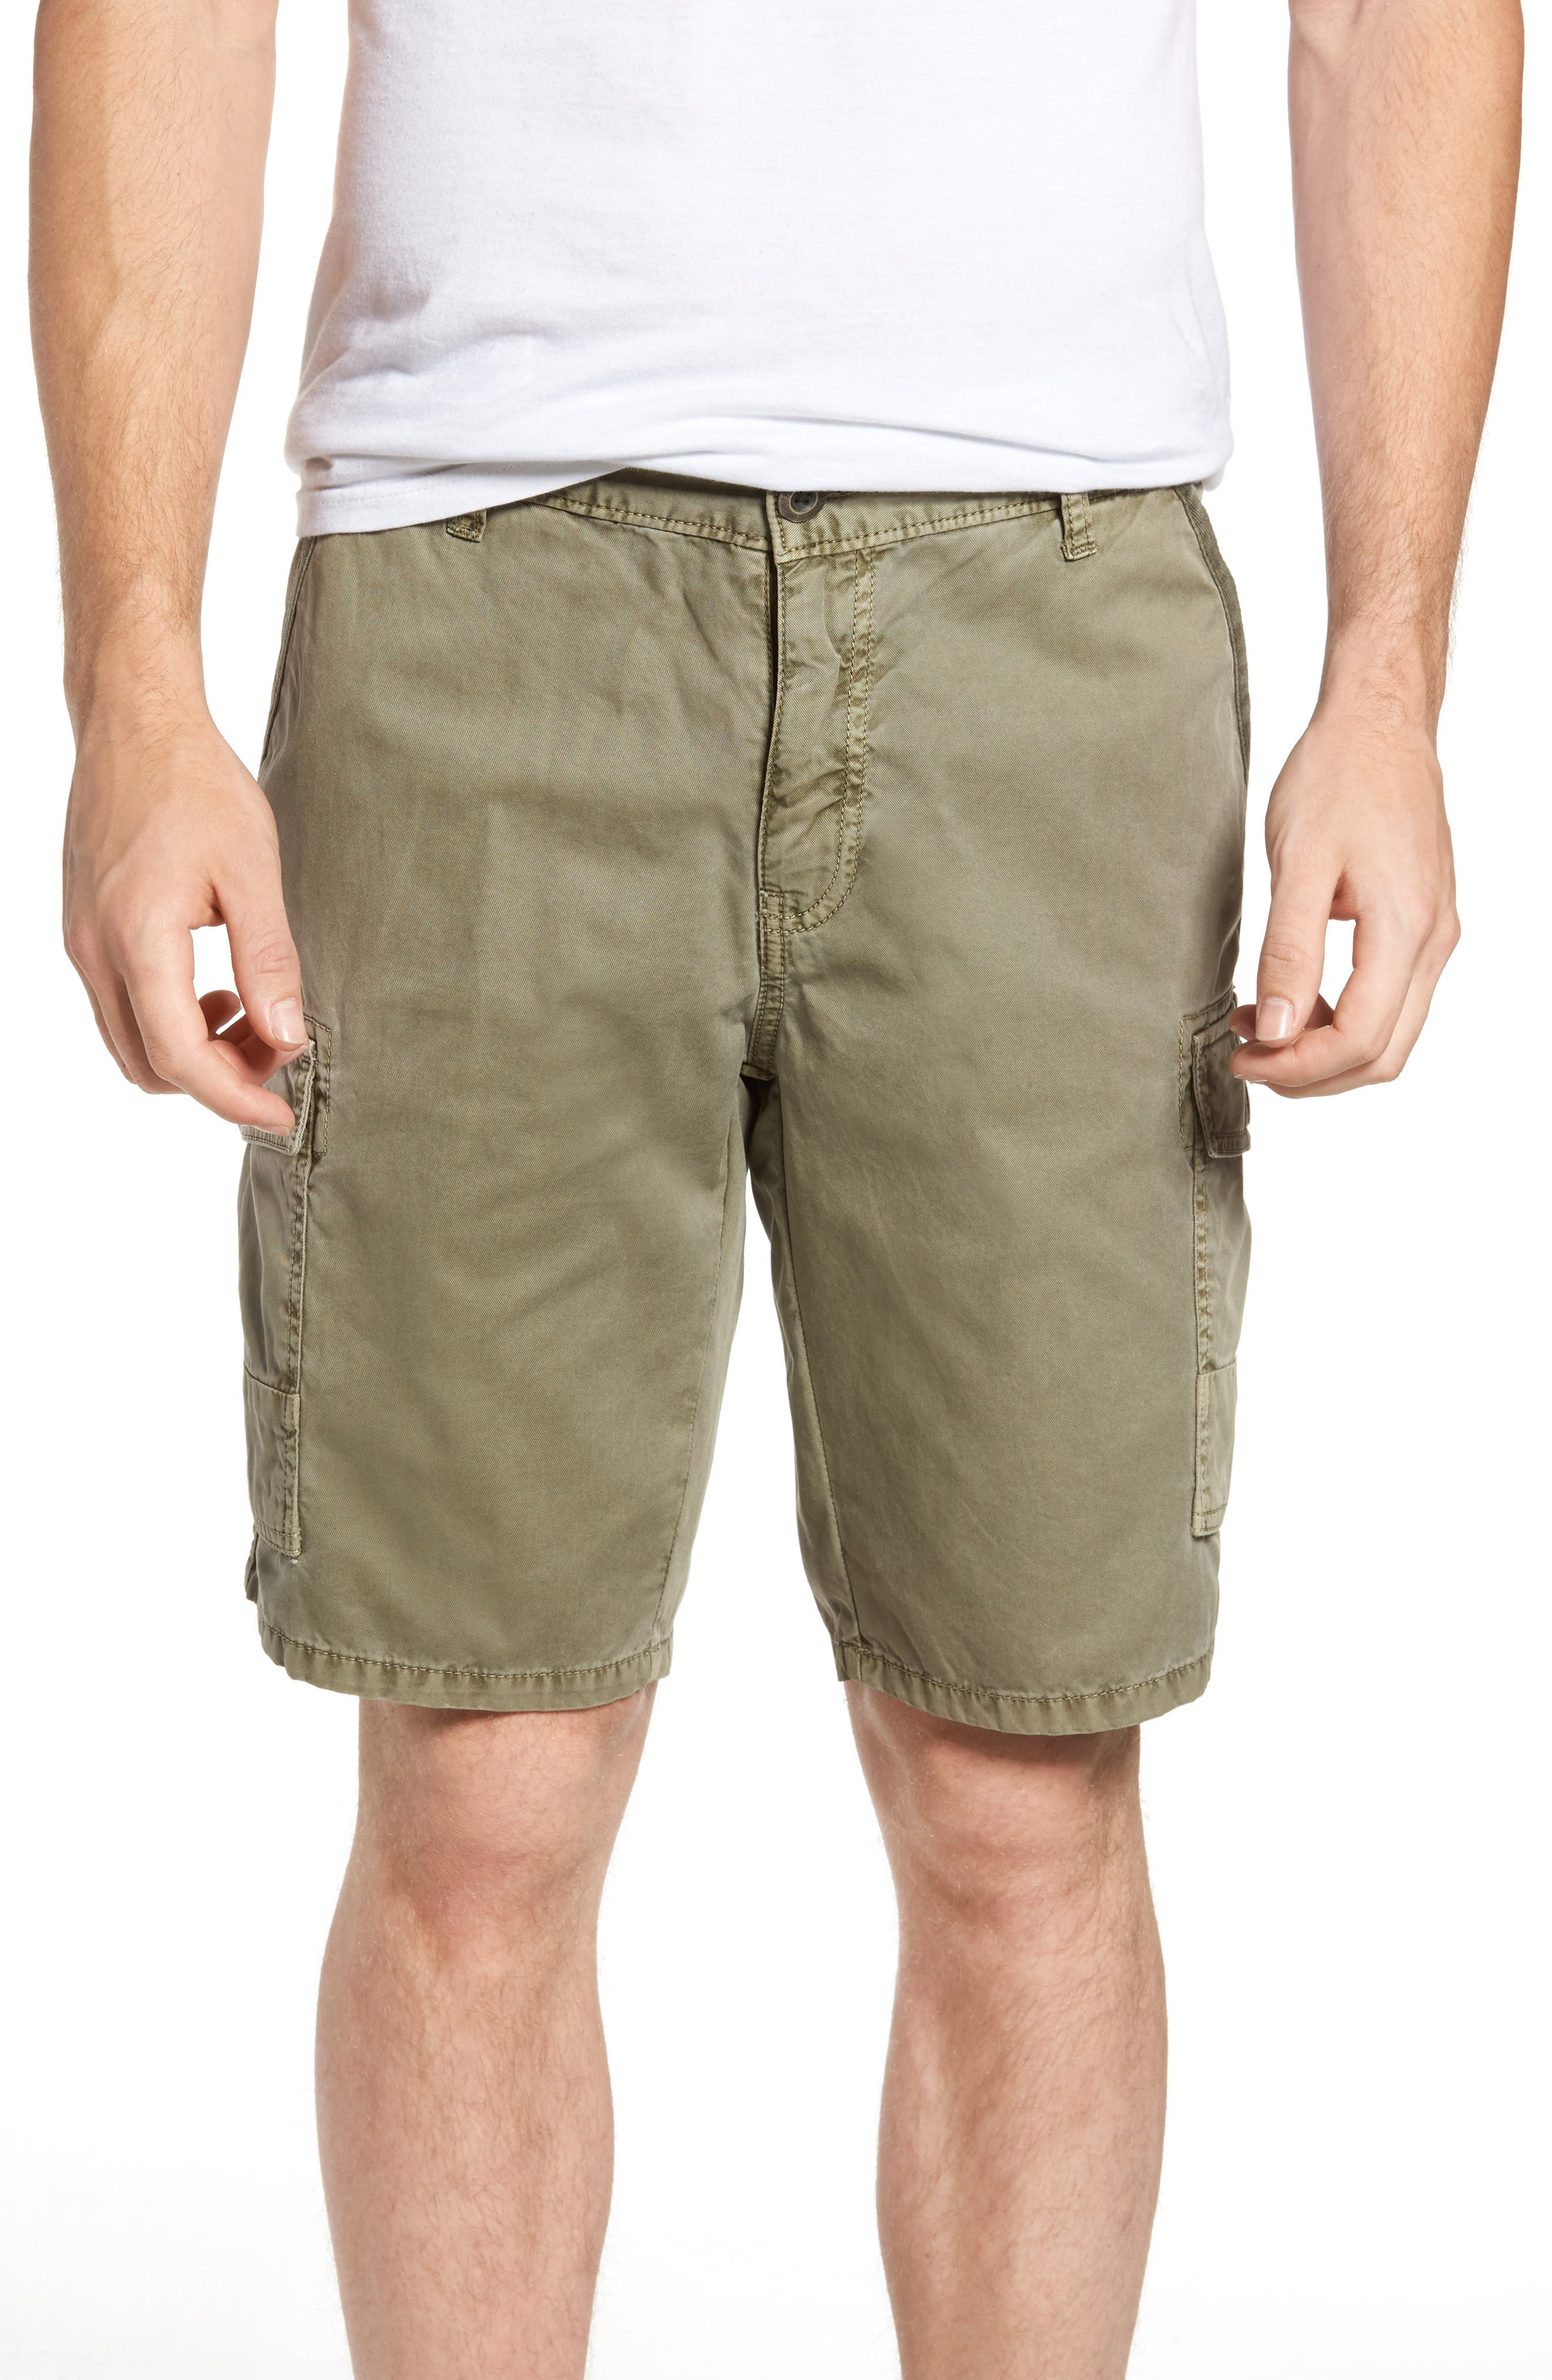 'Newport' Cargo Shorts,                             Main thumbnail 1, color,                             301